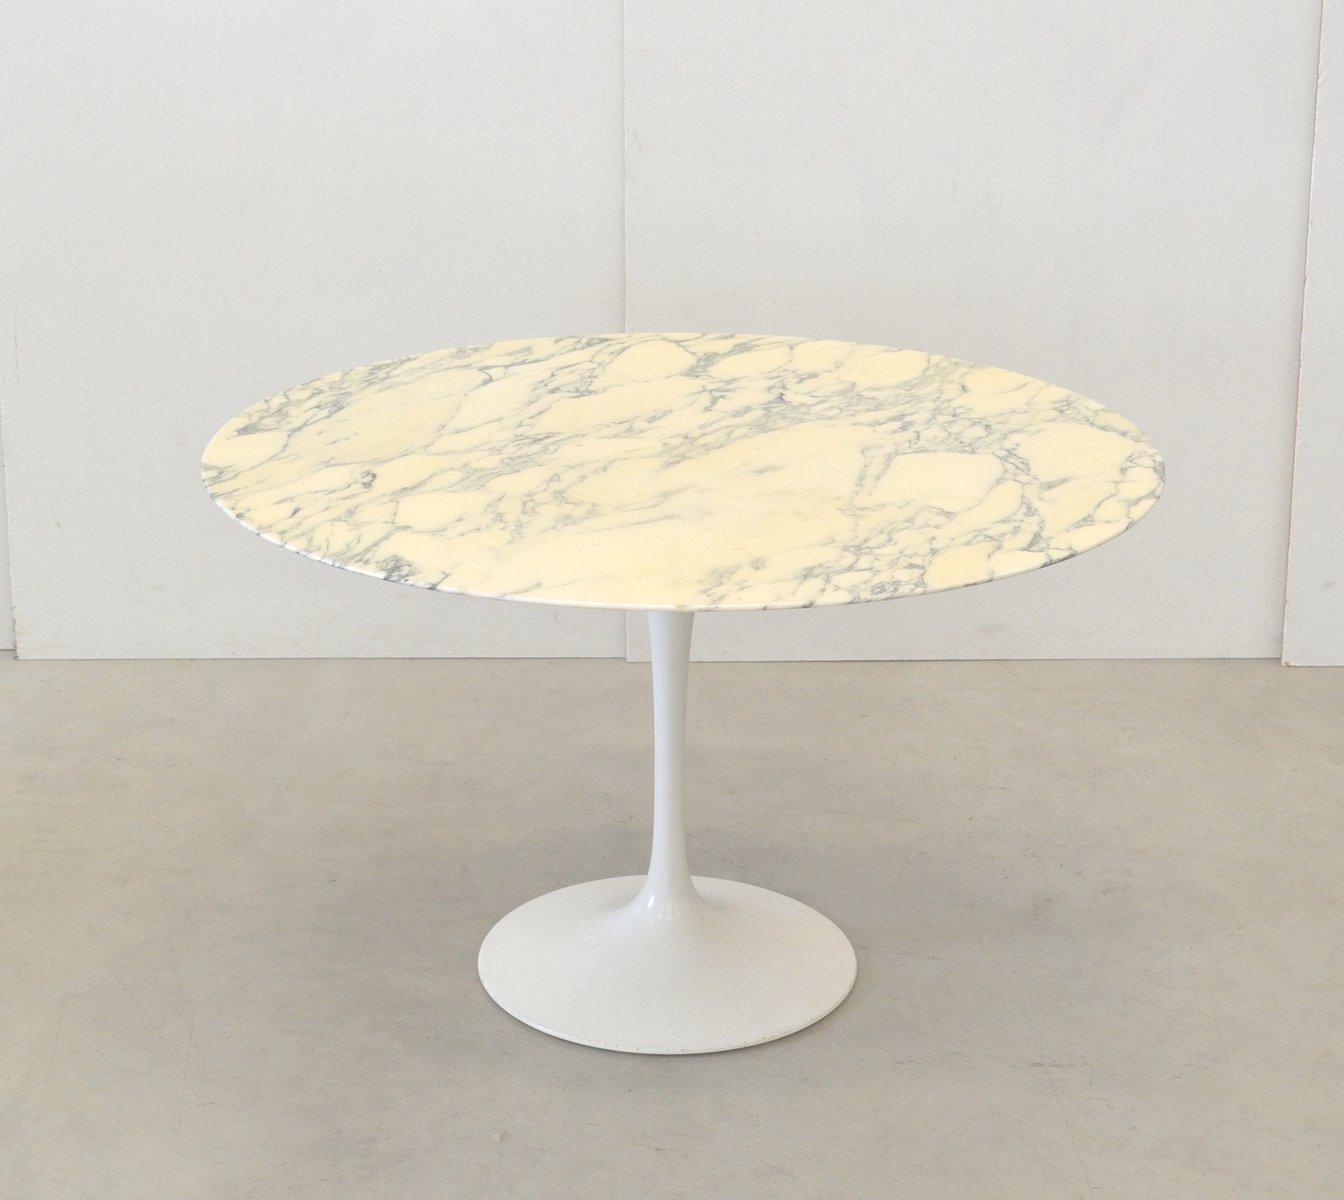 Table de salle manger calacatta en marbre par eero saarinen pour knoll inernational 1970s - Tavolo saarinen knoll originale ...